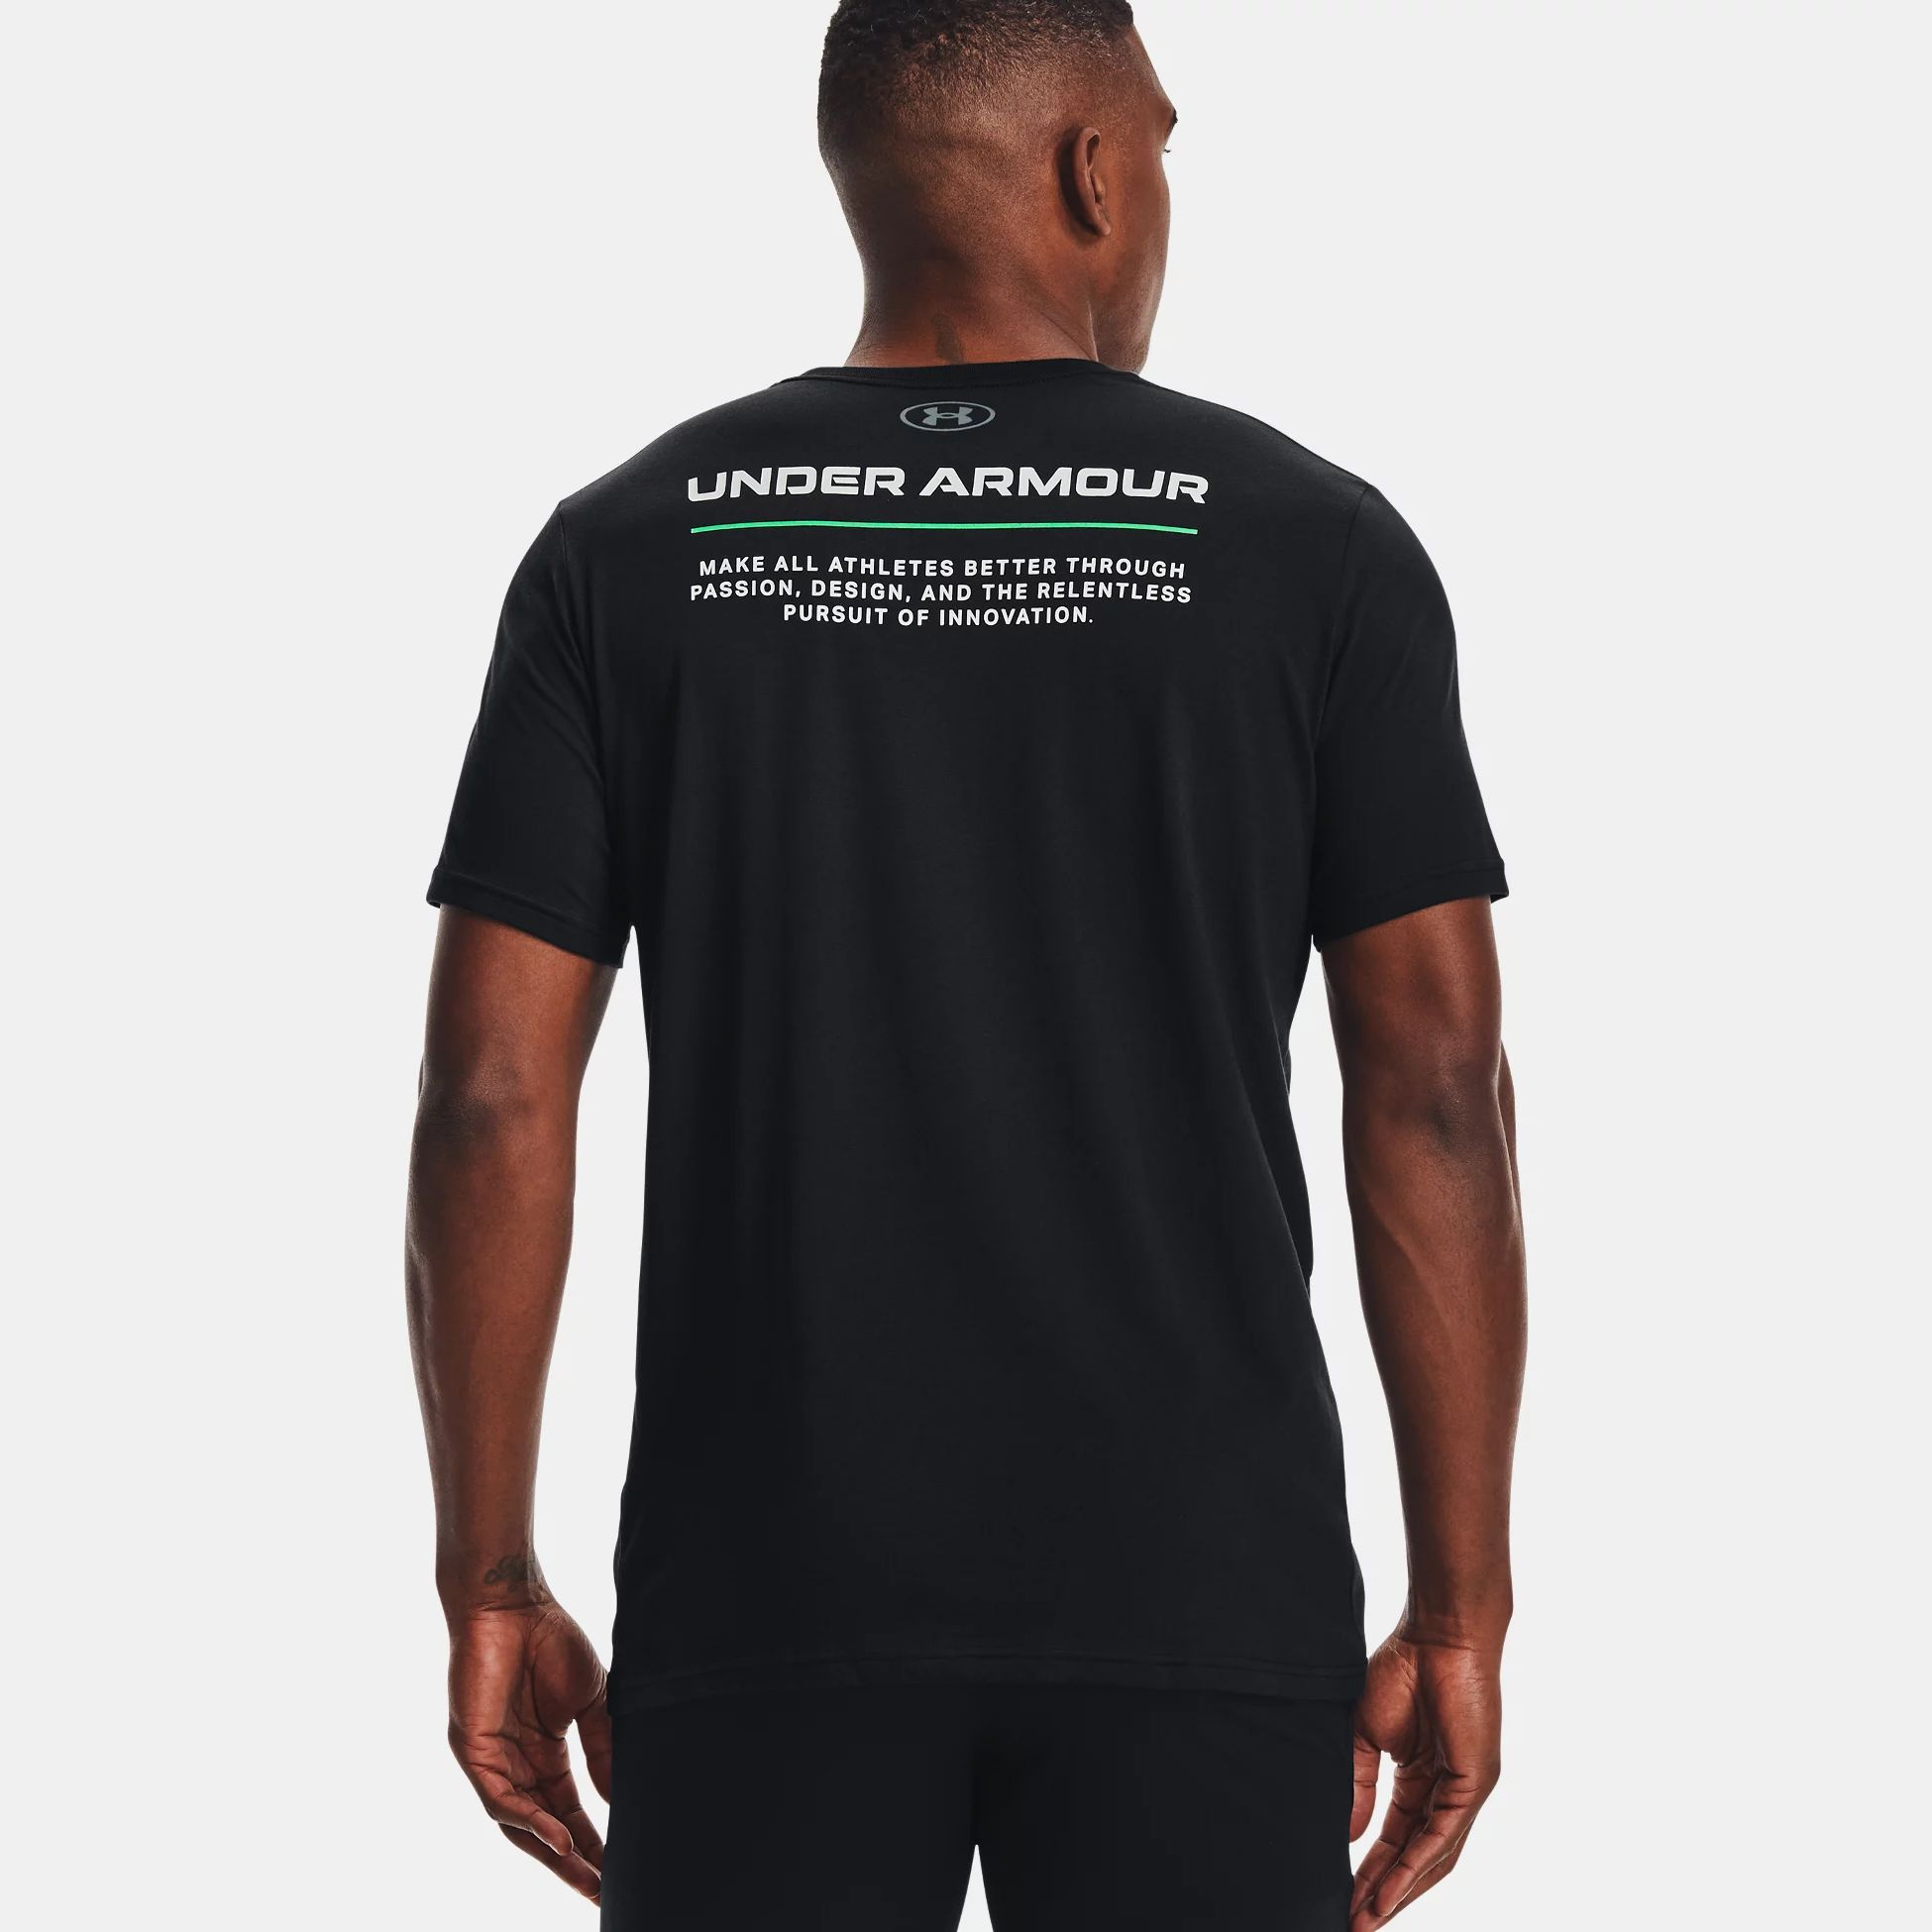 Clothing -  under armour UA Boxed All Athletes Short Sleeve